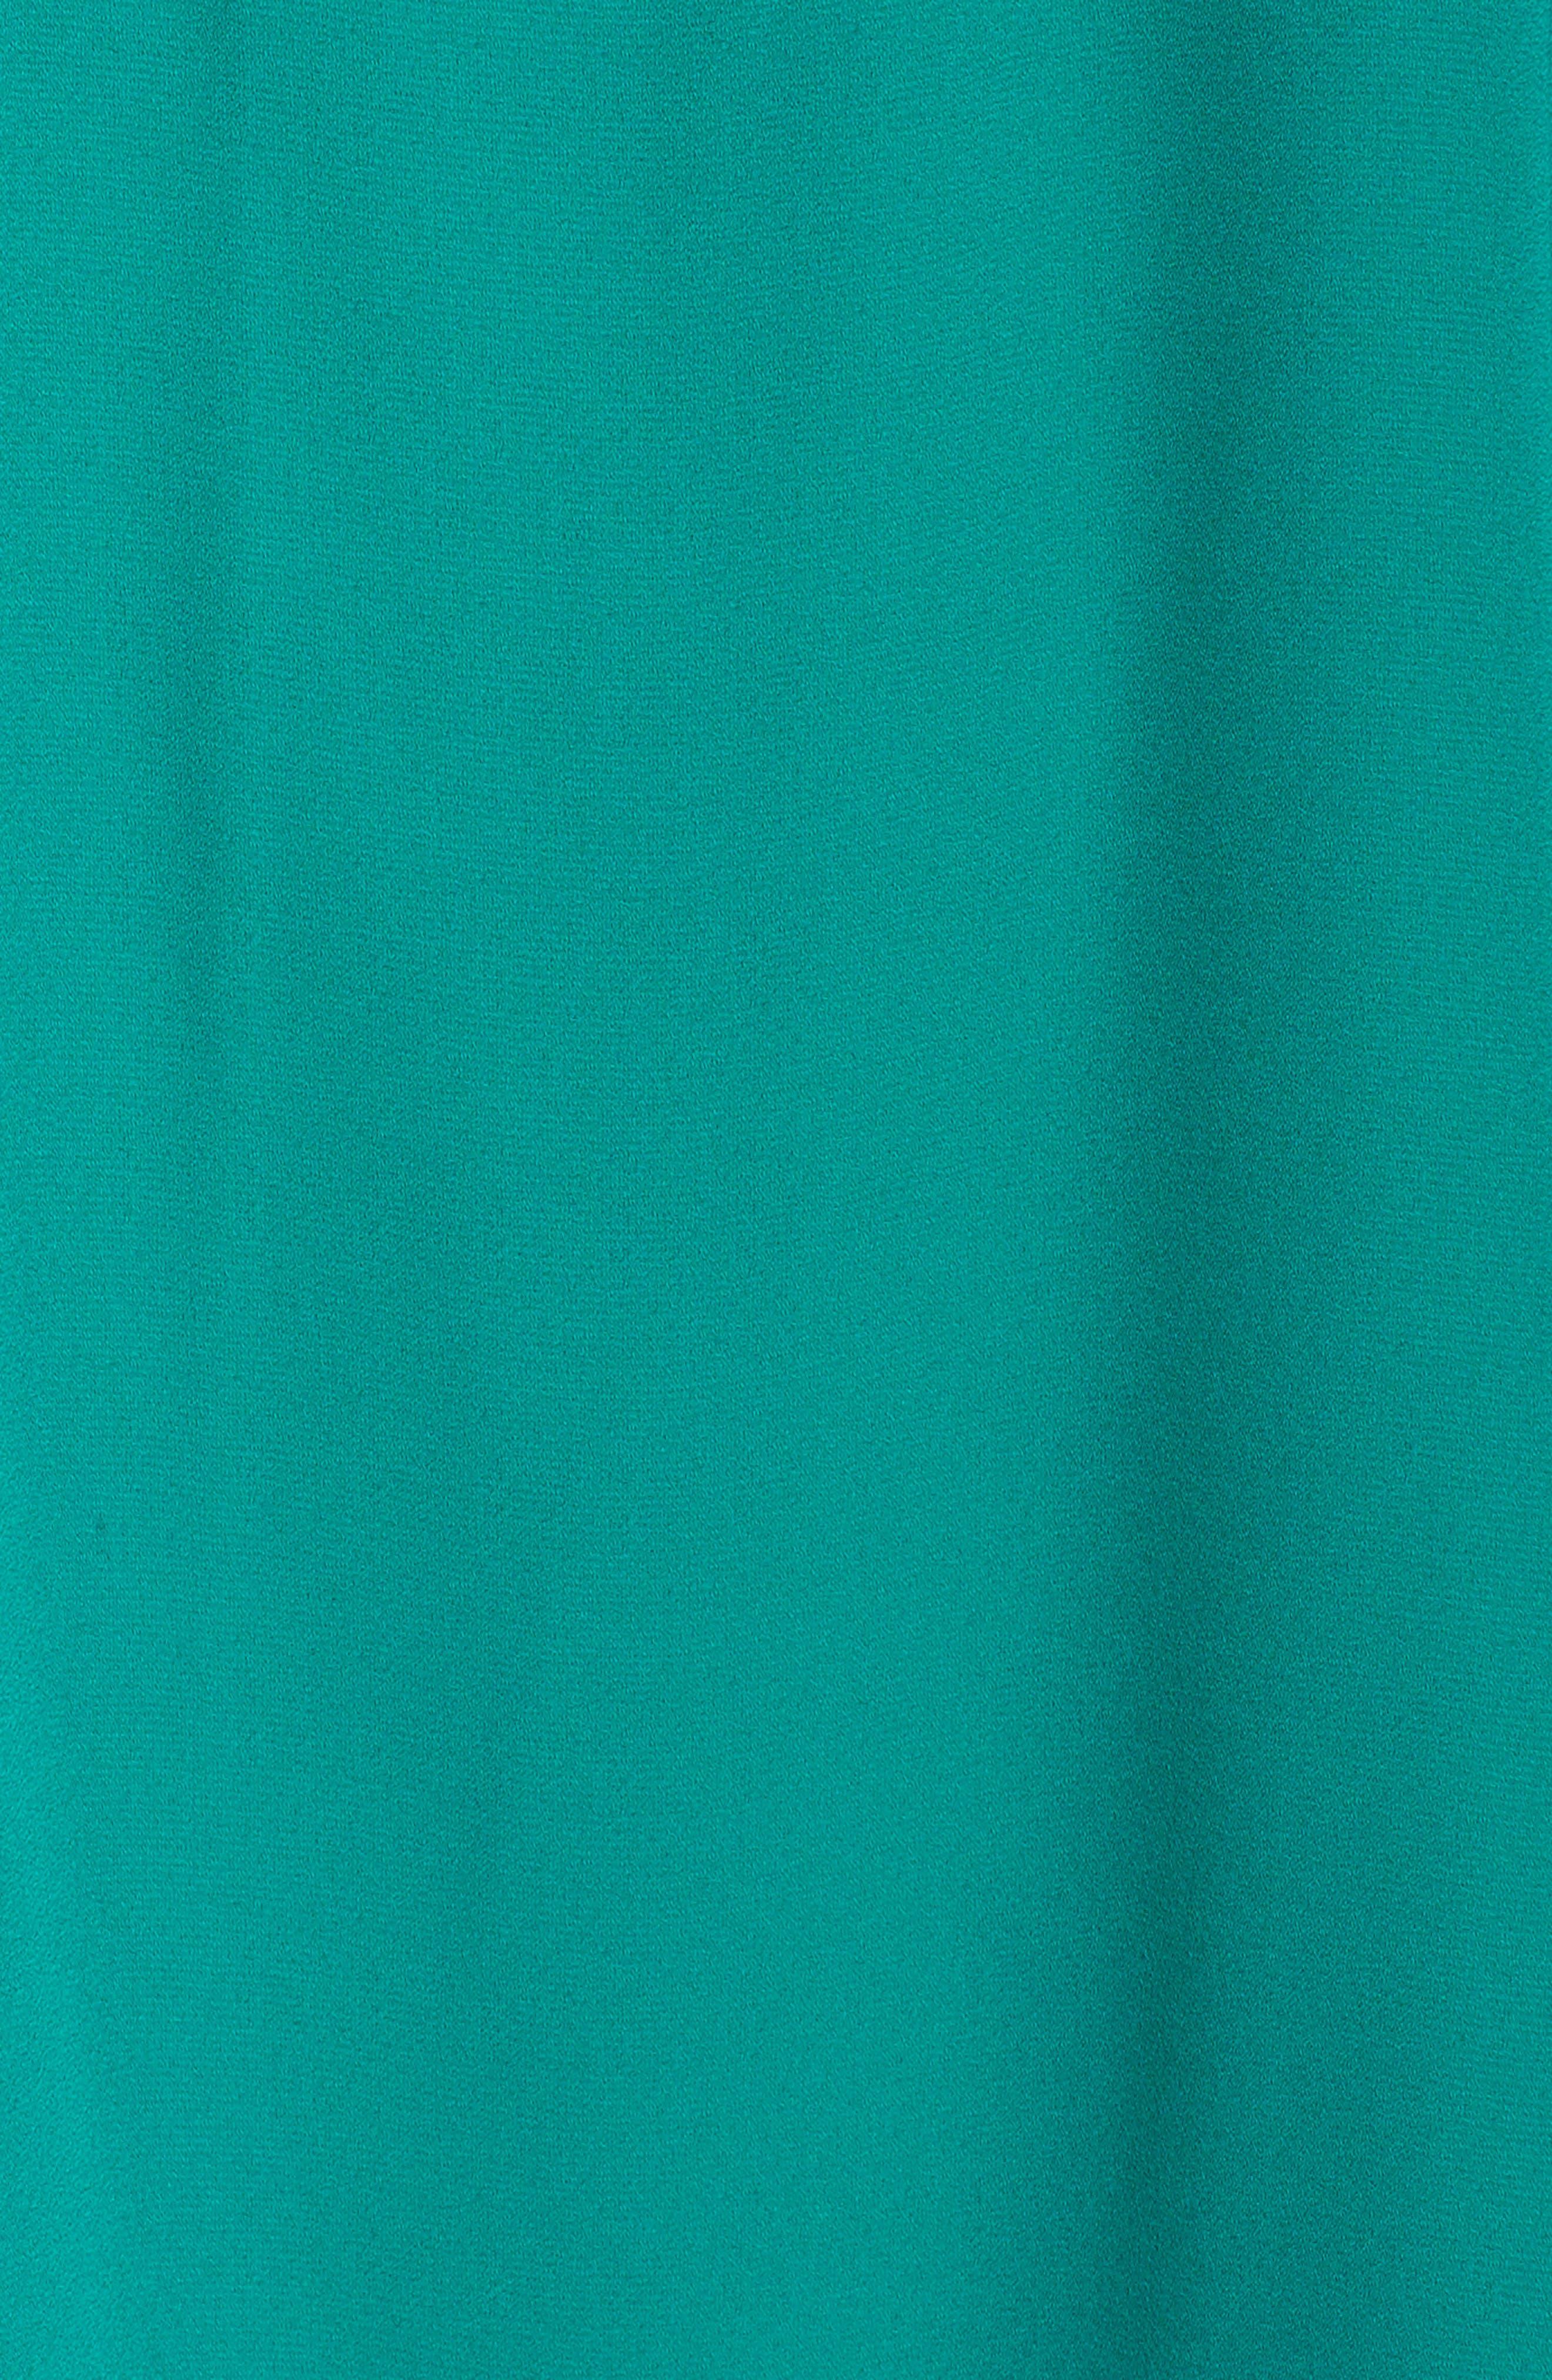 Off the Shoulder Ruffle Dress,                             Alternate thumbnail 38, color,